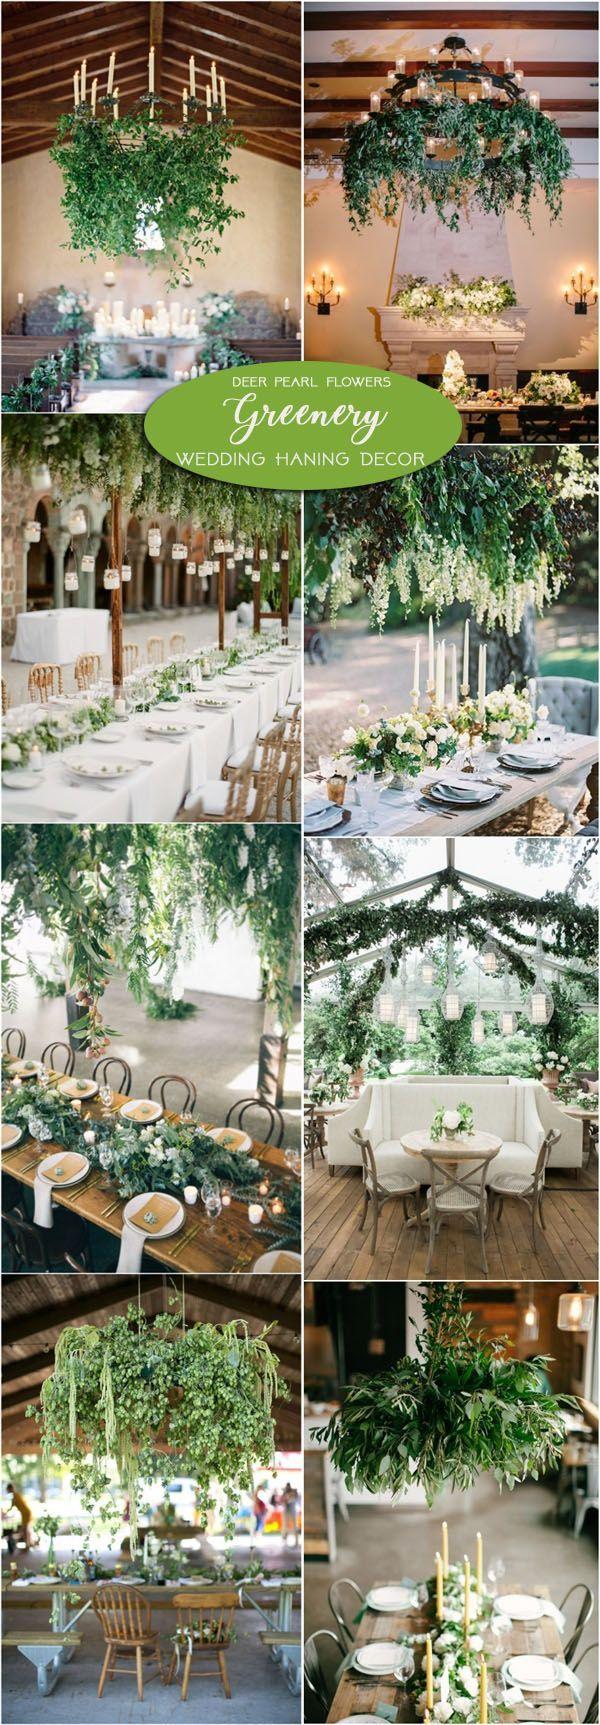 Greenery wedding hanging decor ideas / http://www.deerpearlflowers.com/greenery-wedding-decor-ideas/2/